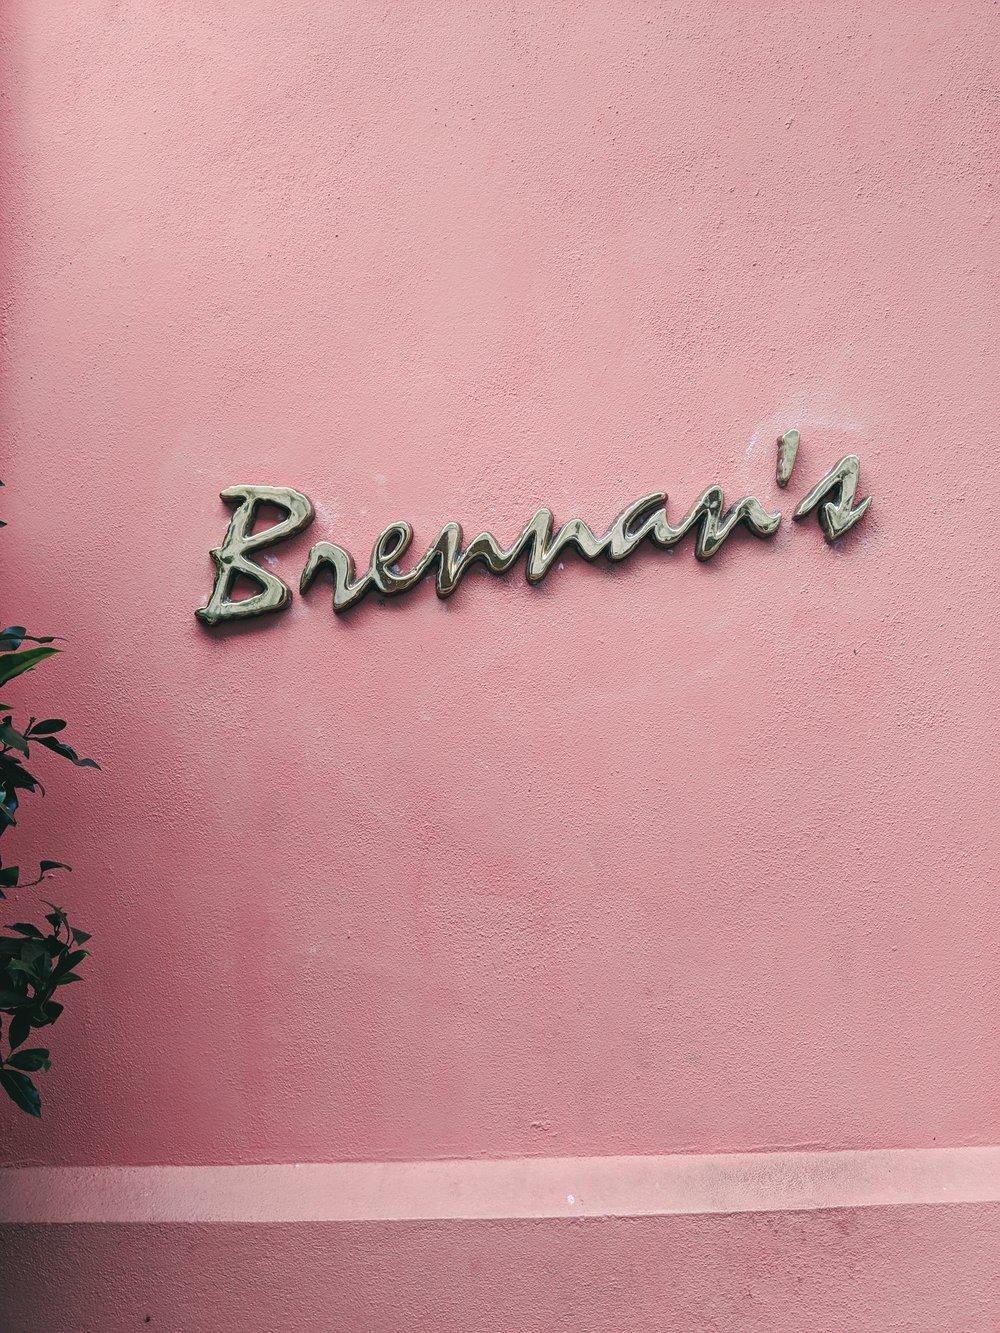 brennans1.jpg